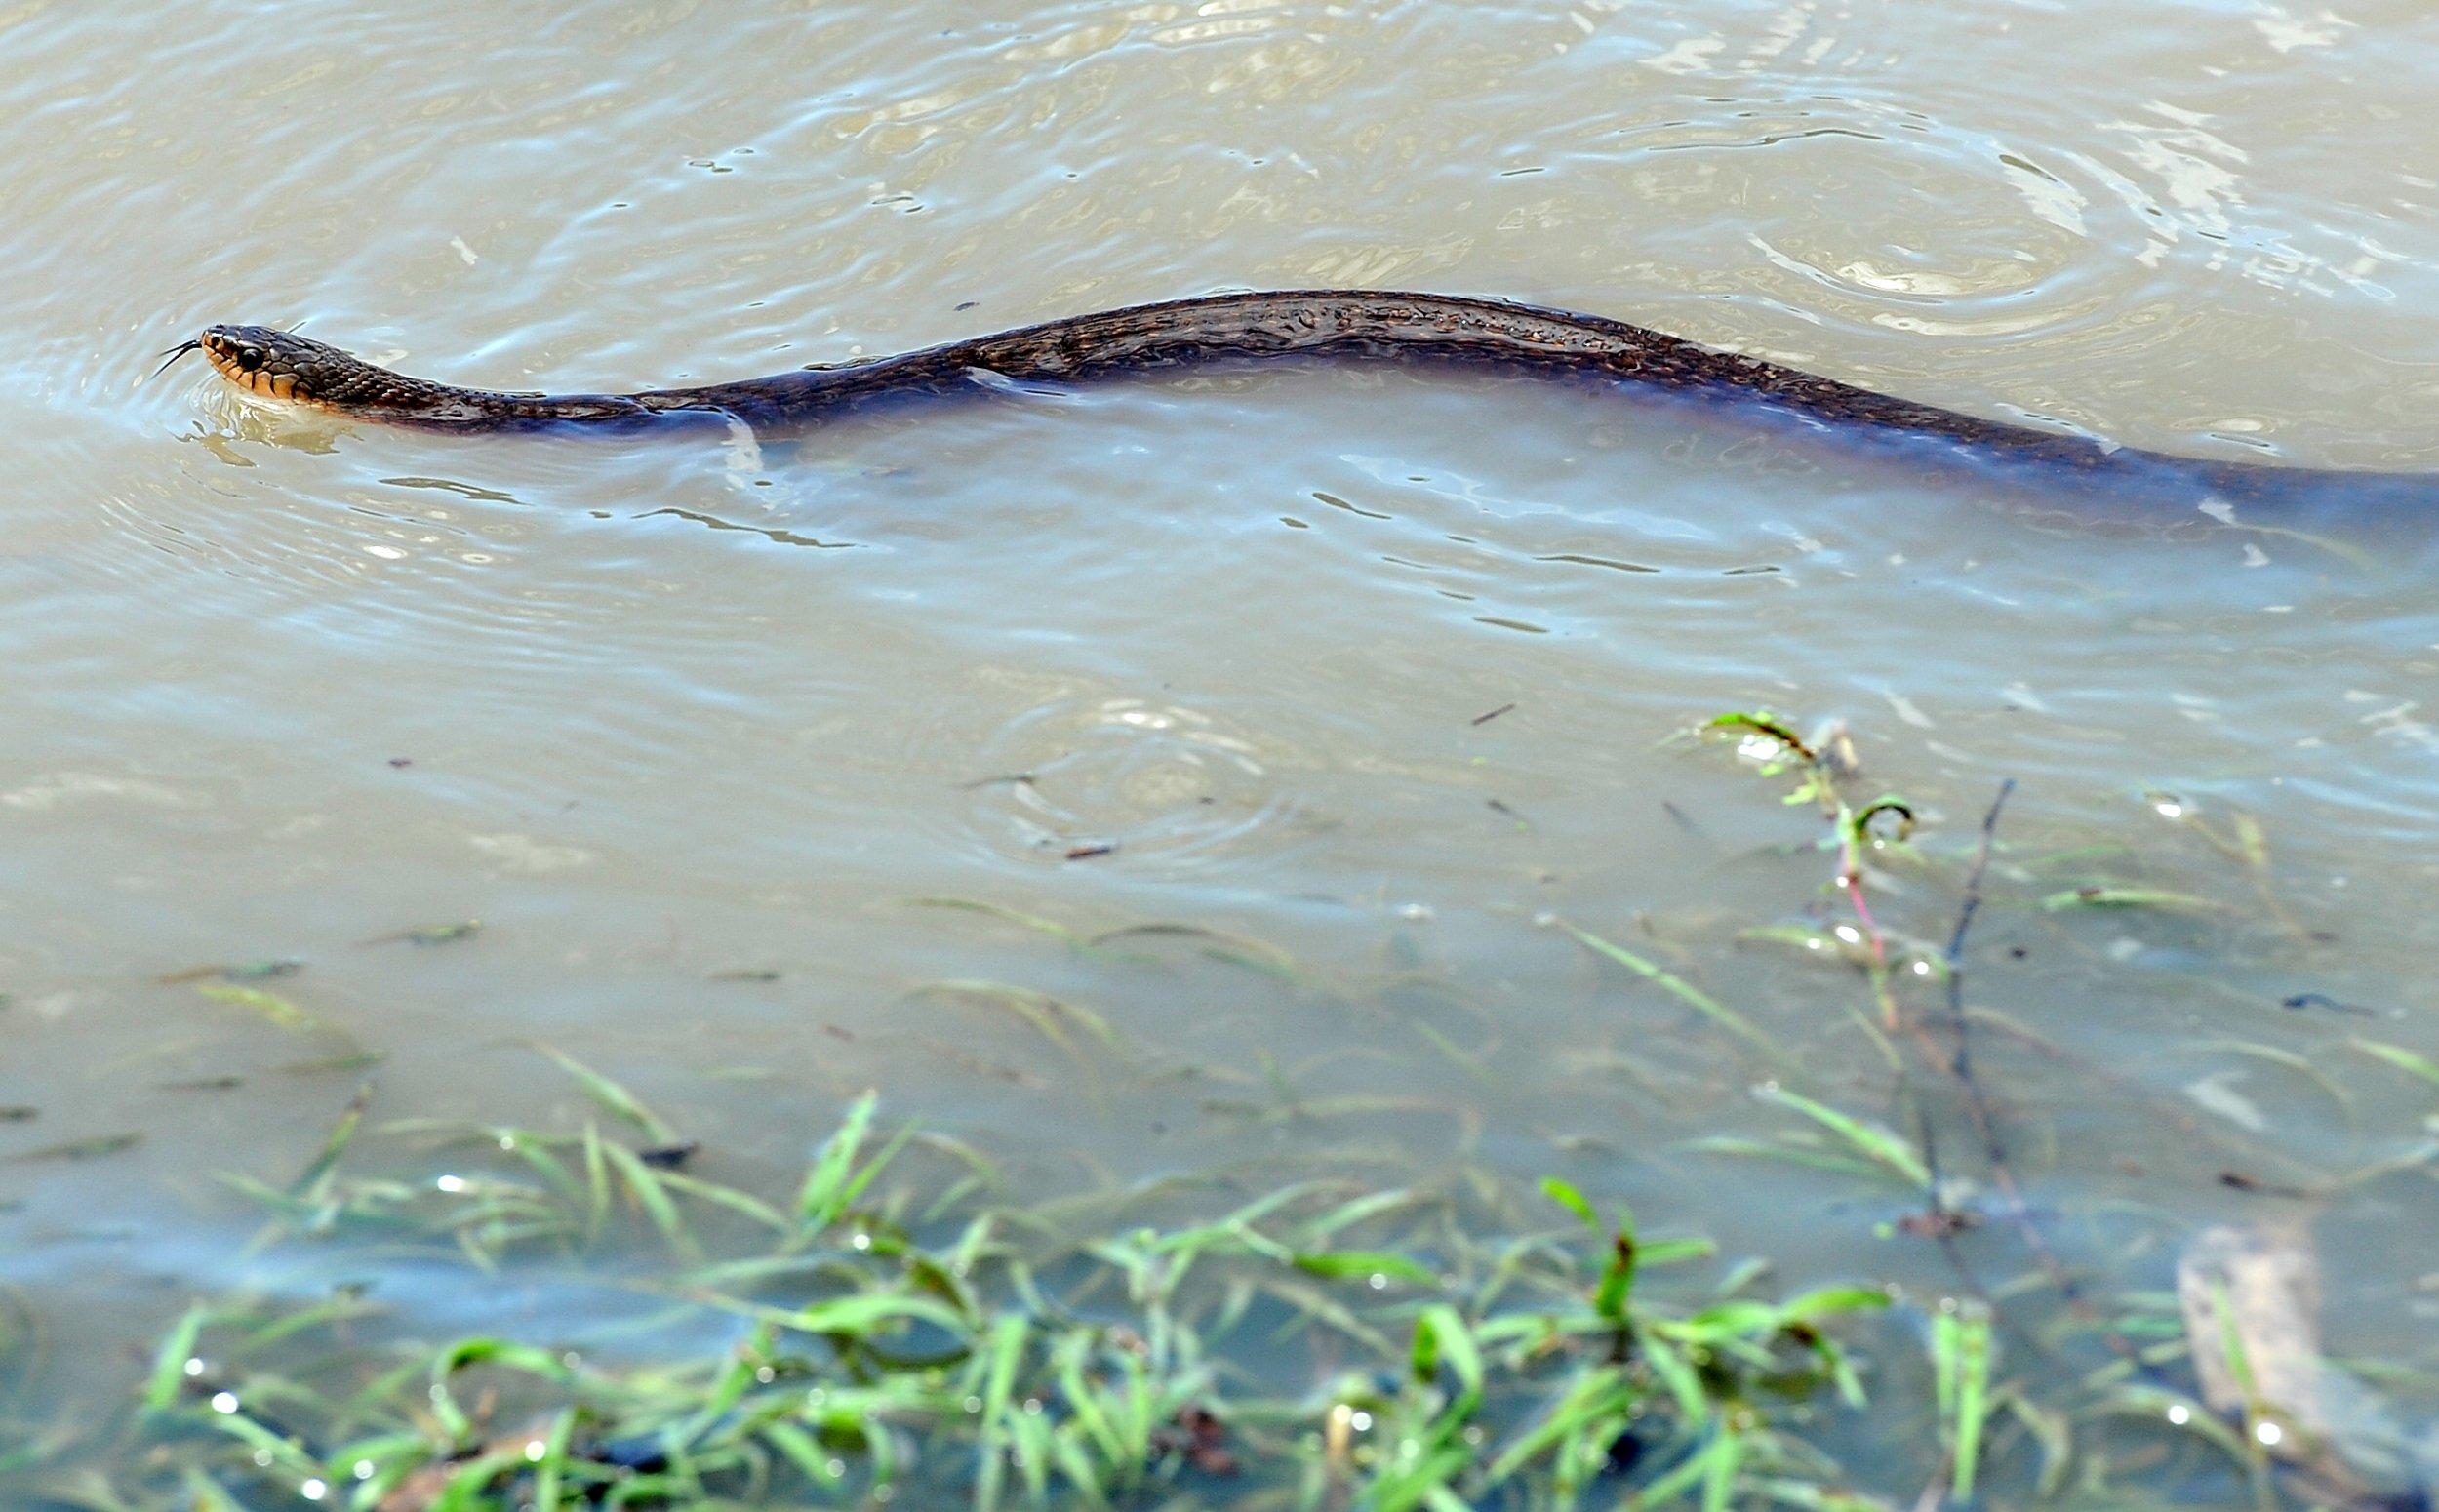 3_22_venomous snake